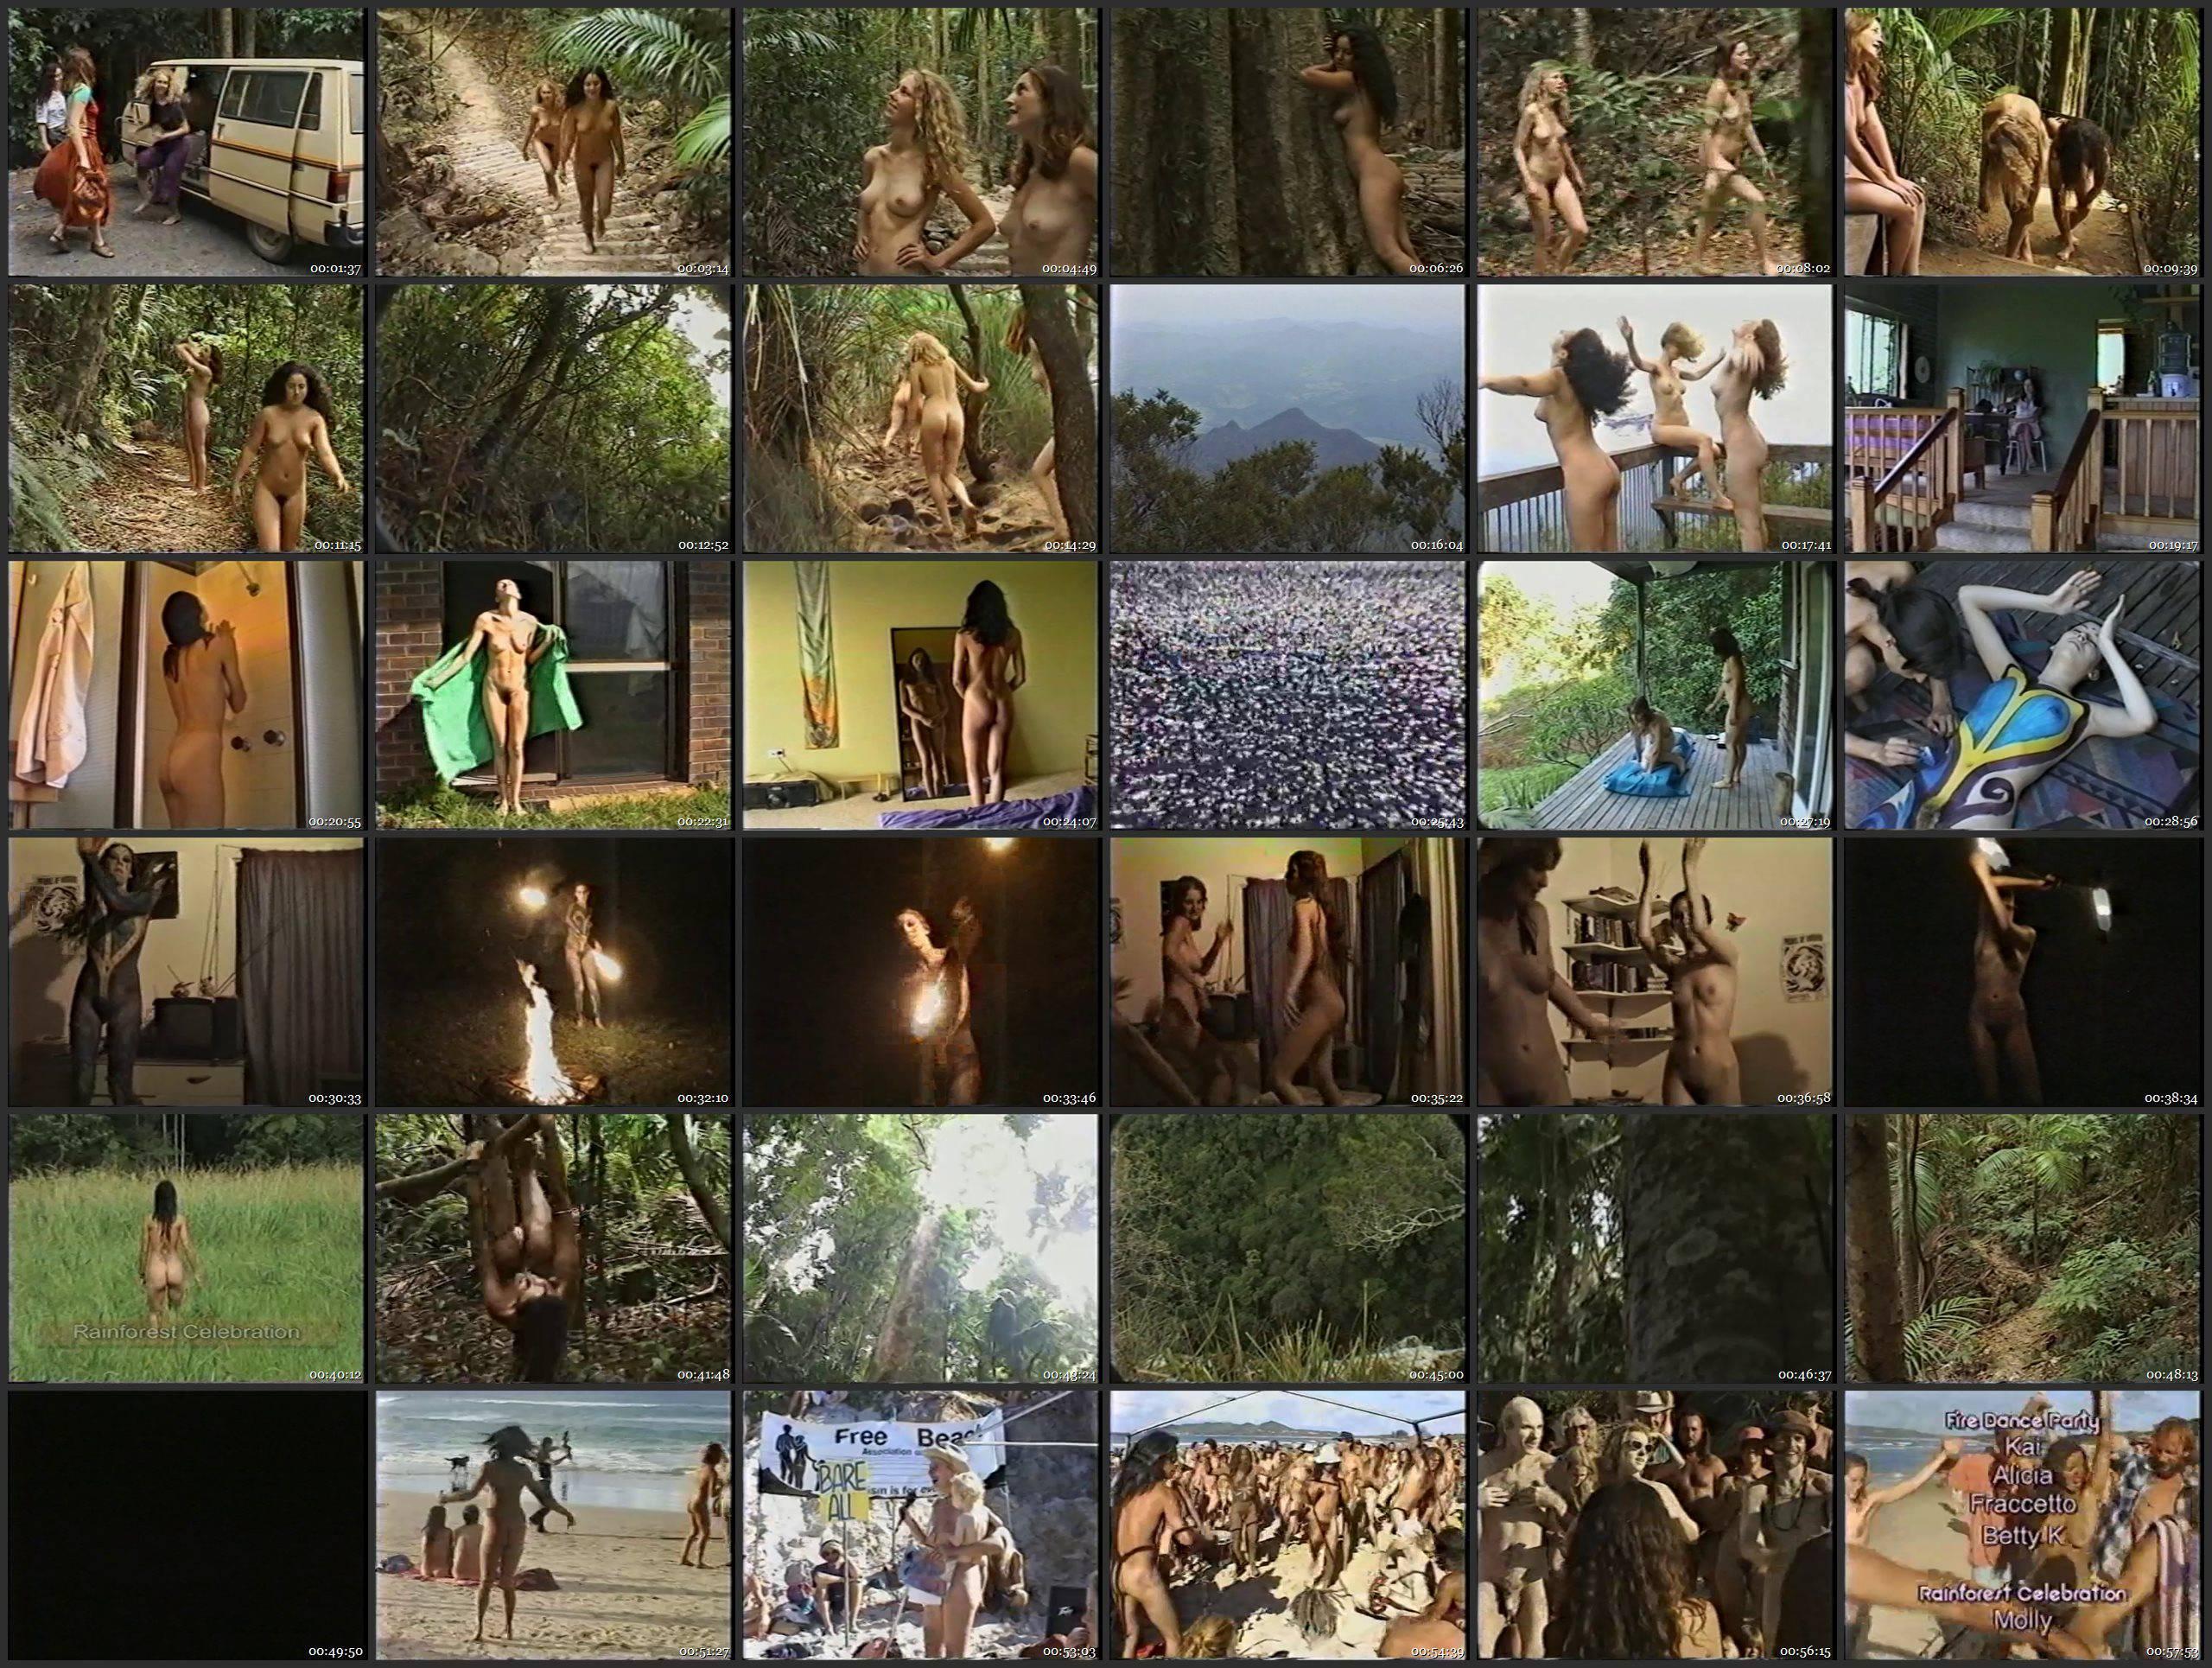 Naturist Videos-Naked Celebrations - Thumbnails